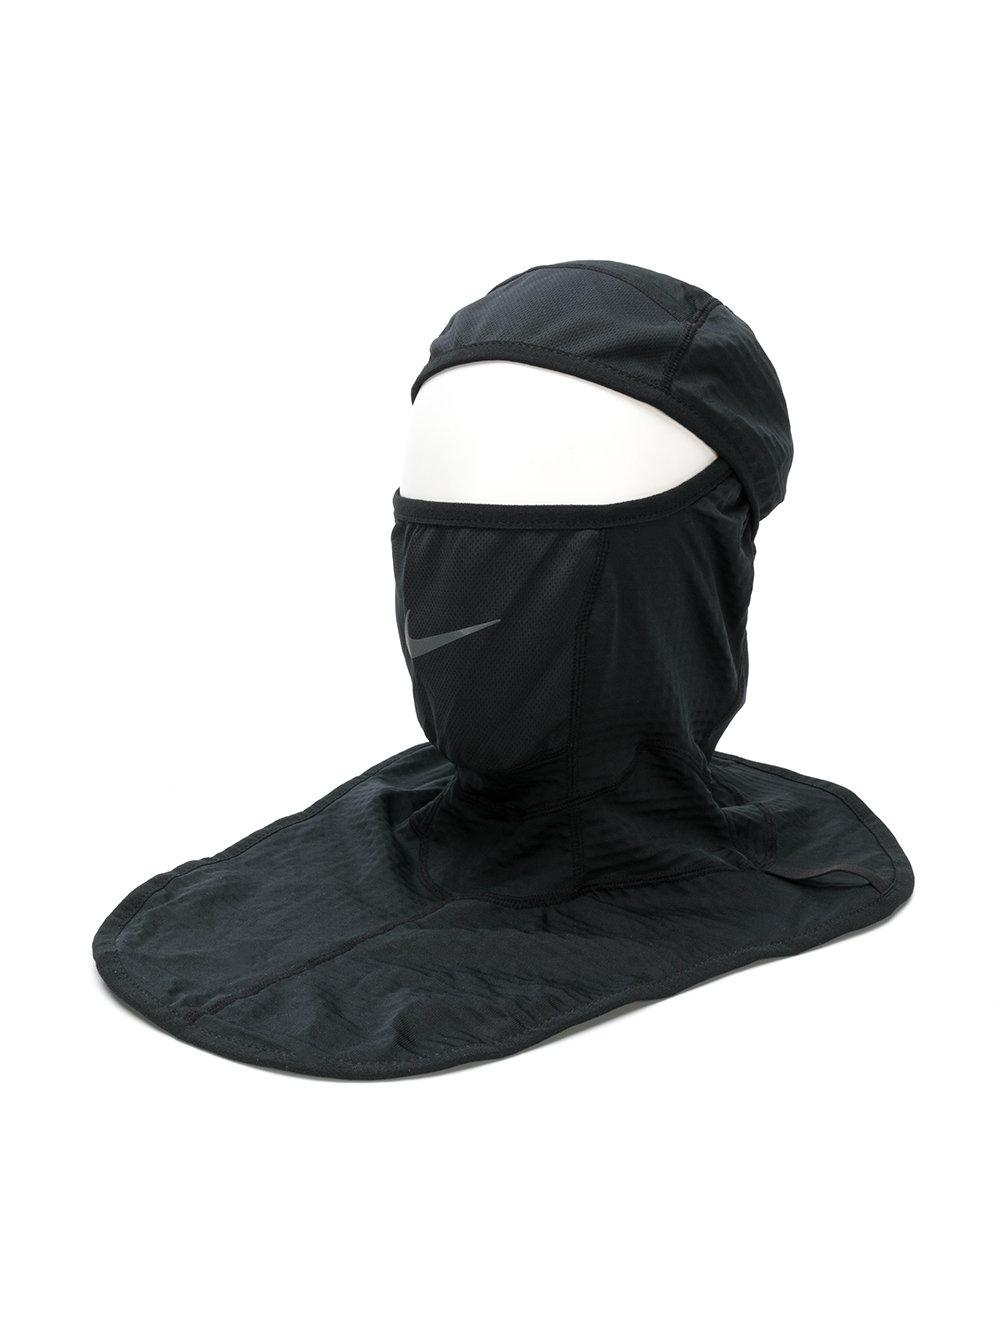 51b2cd57992 Lyst - Nike Nsw Balaclava in Black for Men